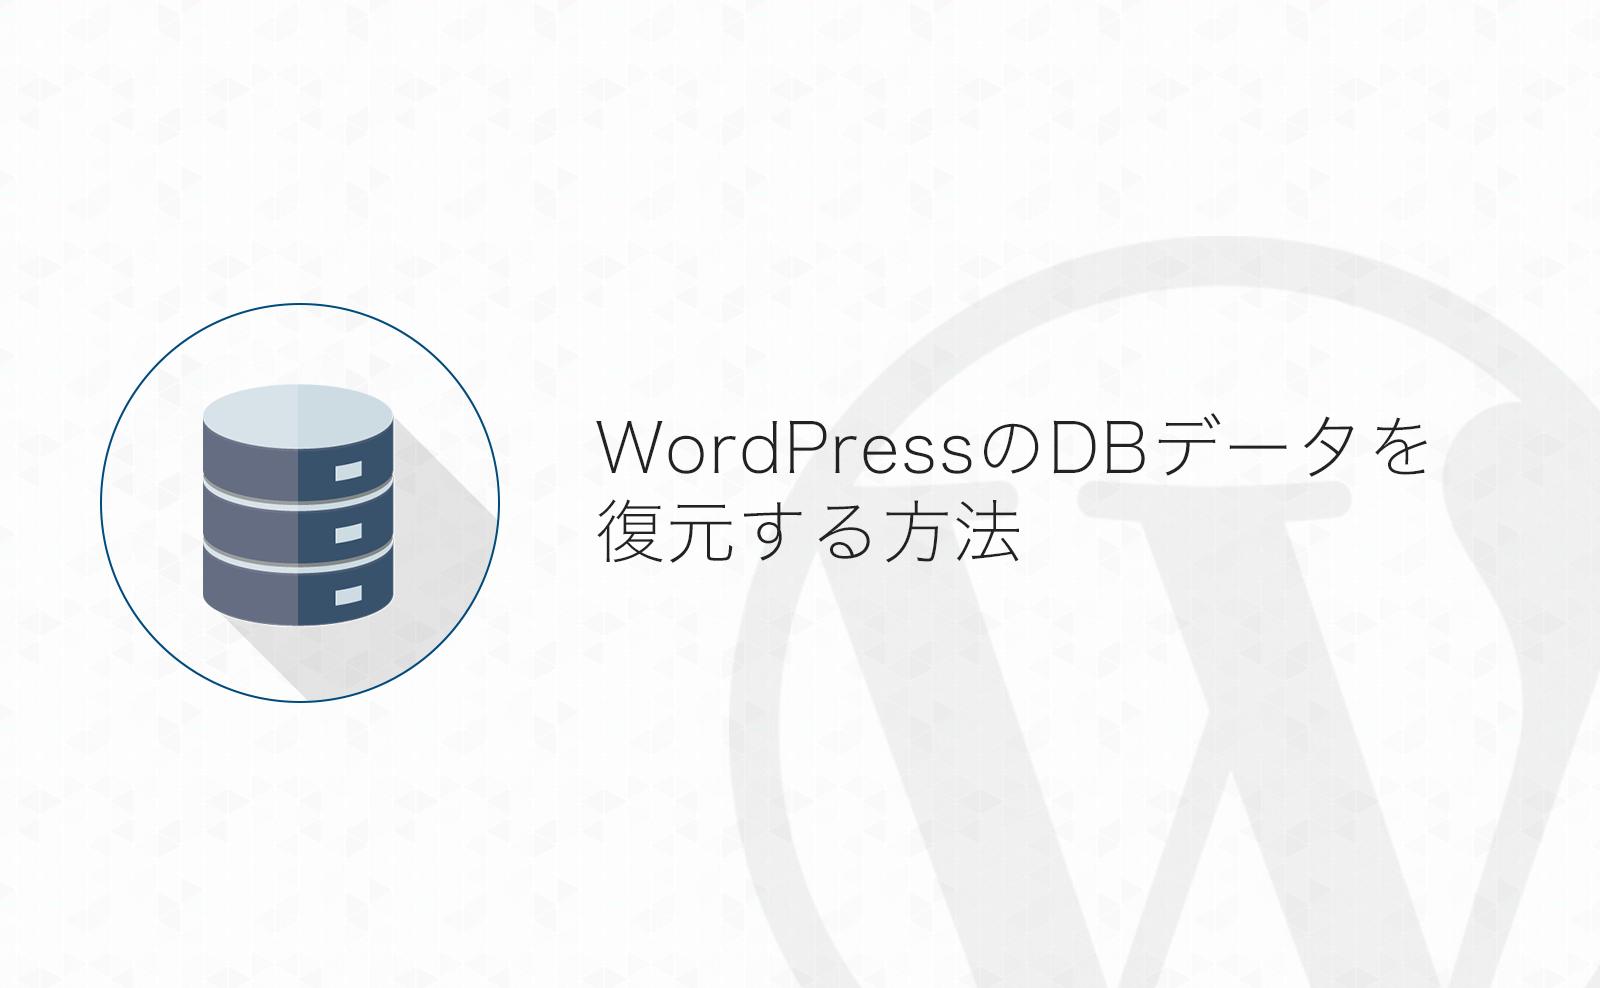 WordPressのバックアップしたデータベースのデータを復元する方法